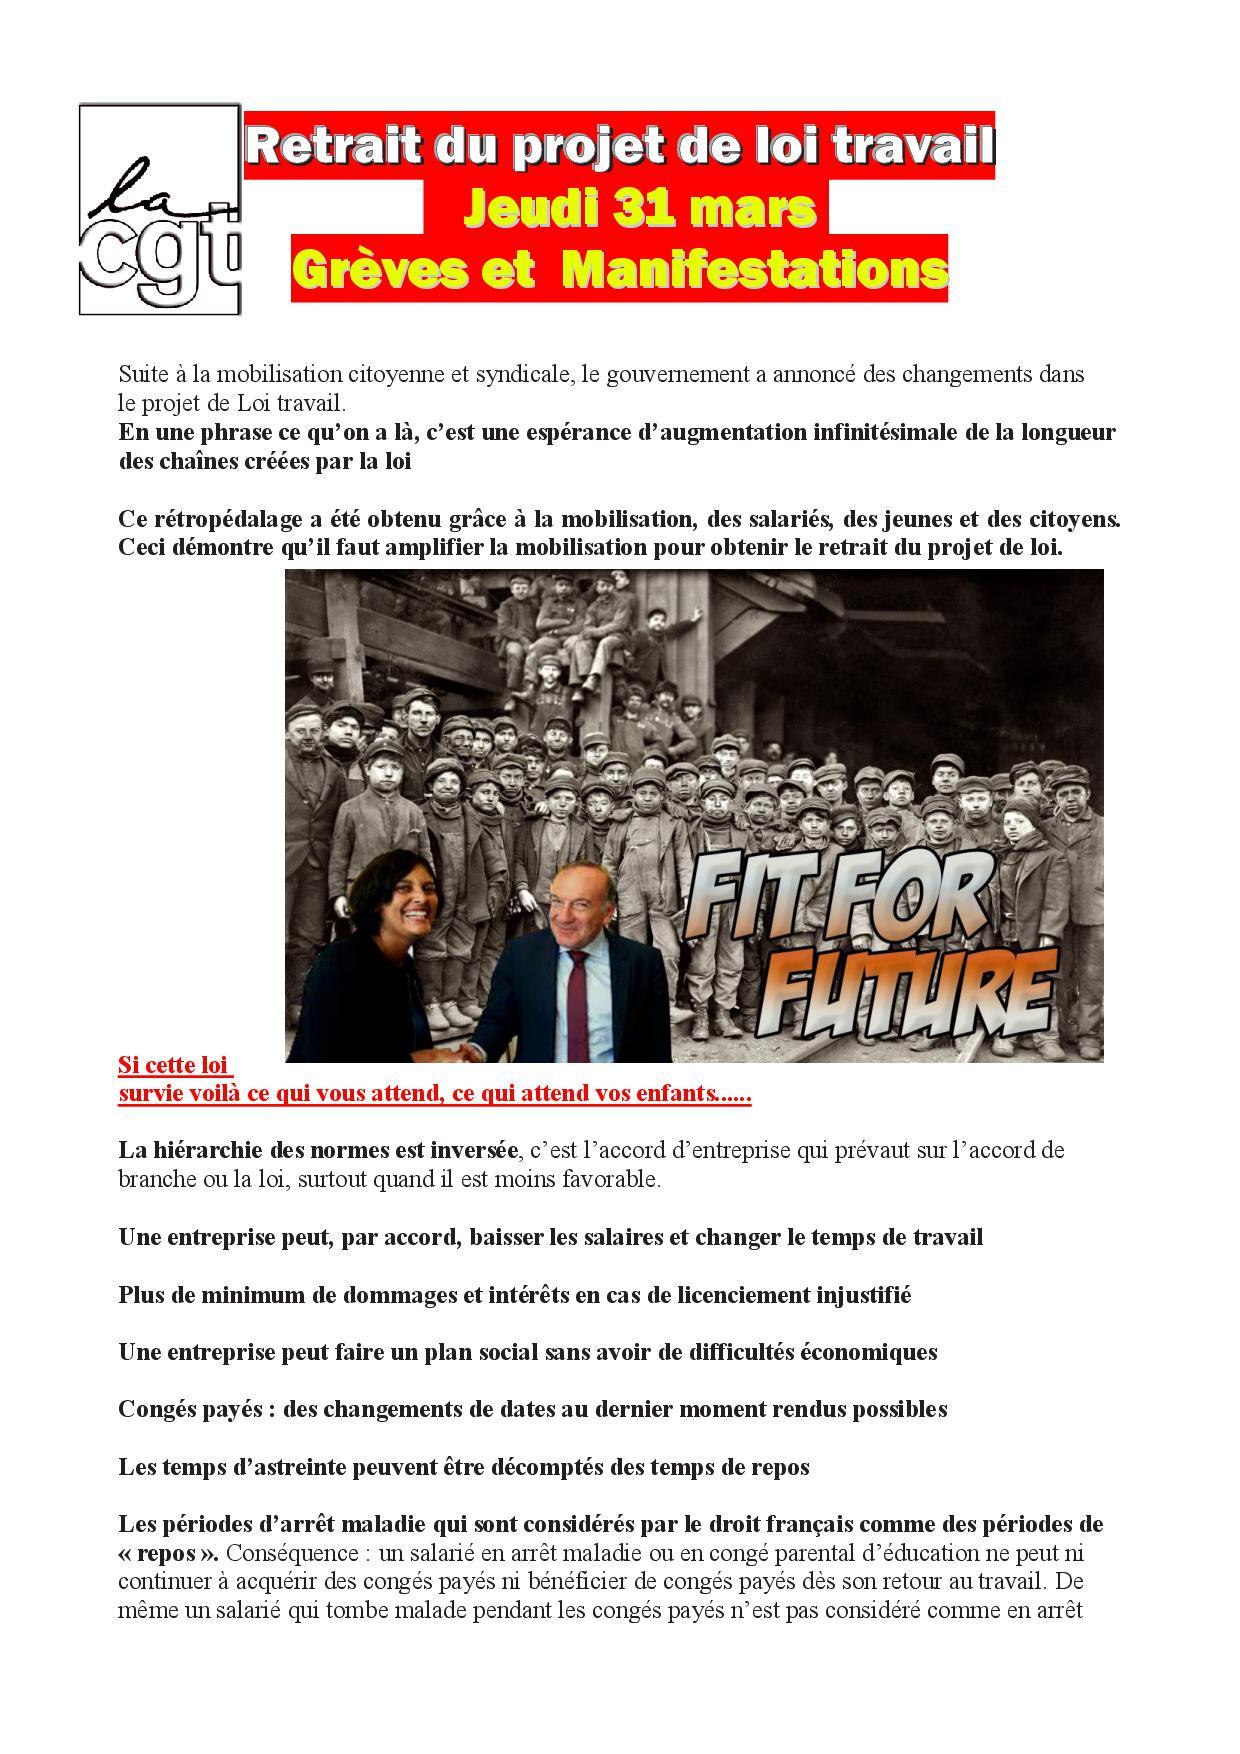 tour greve 31 mars (1)